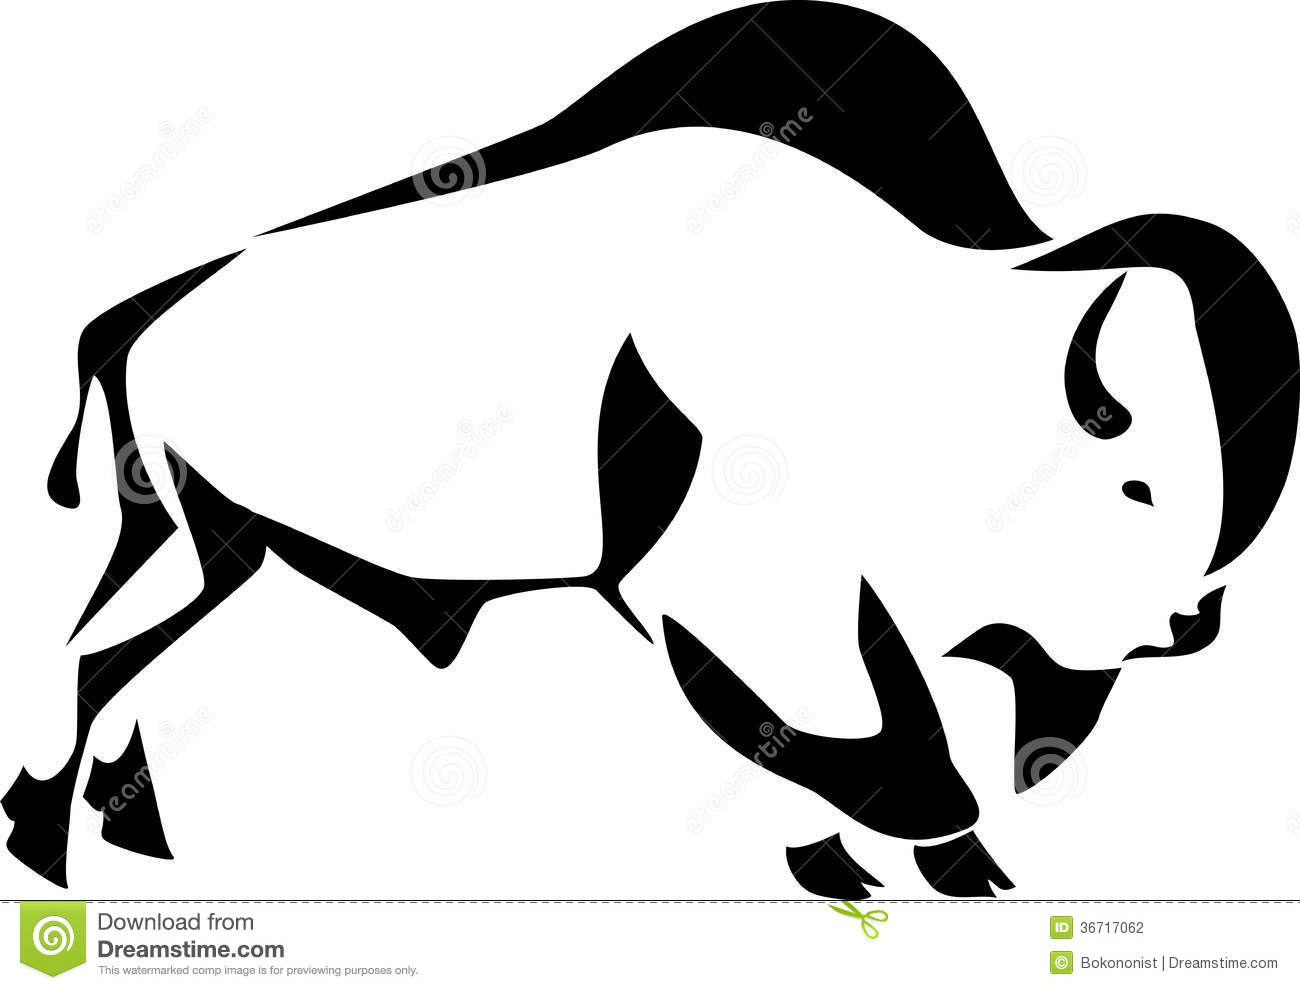 Bison Clipart | Clipart Panda - Free Clipart Images